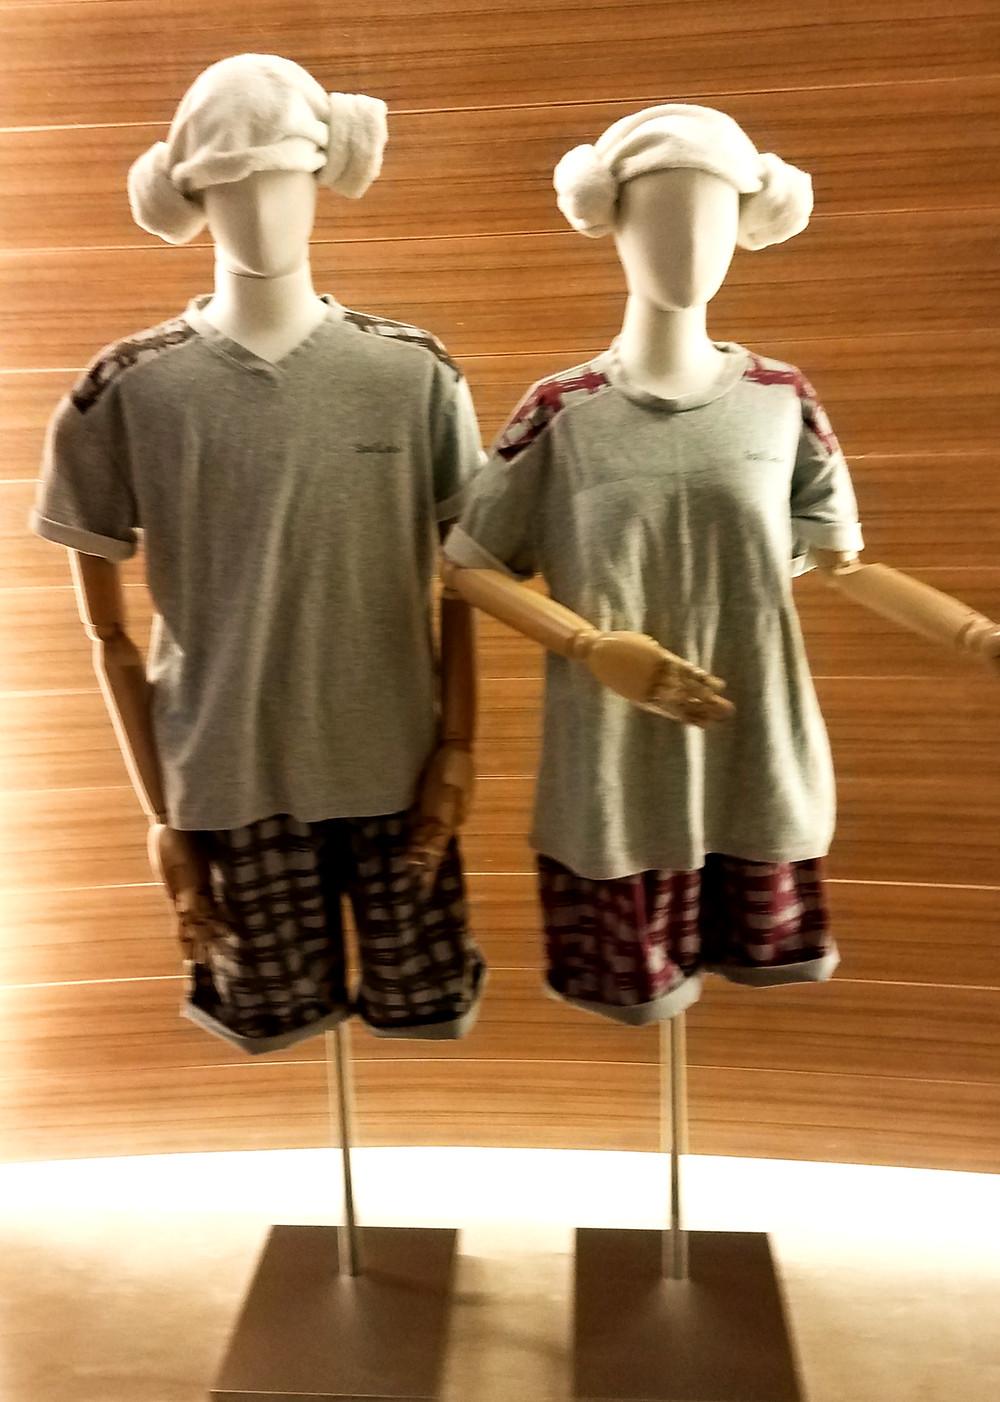 Spa Land towel headwear and uniform